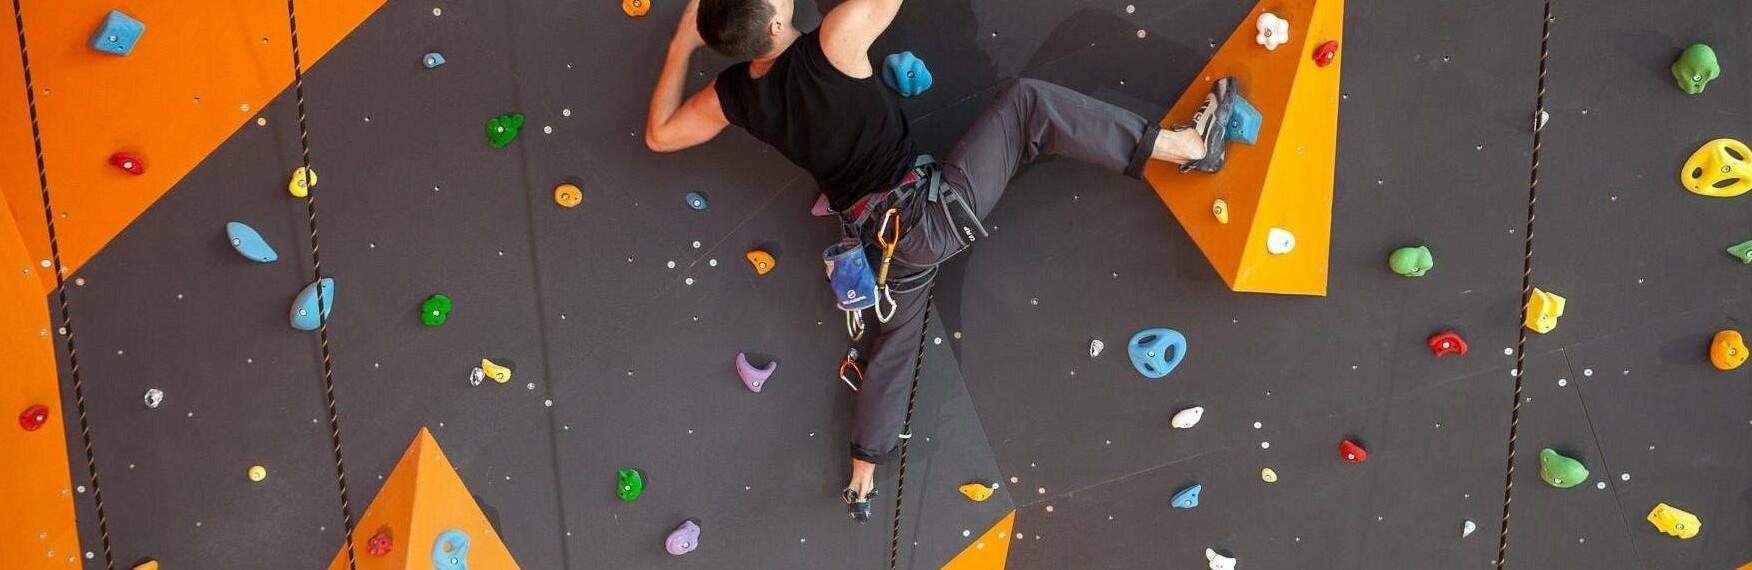 rock climber грати